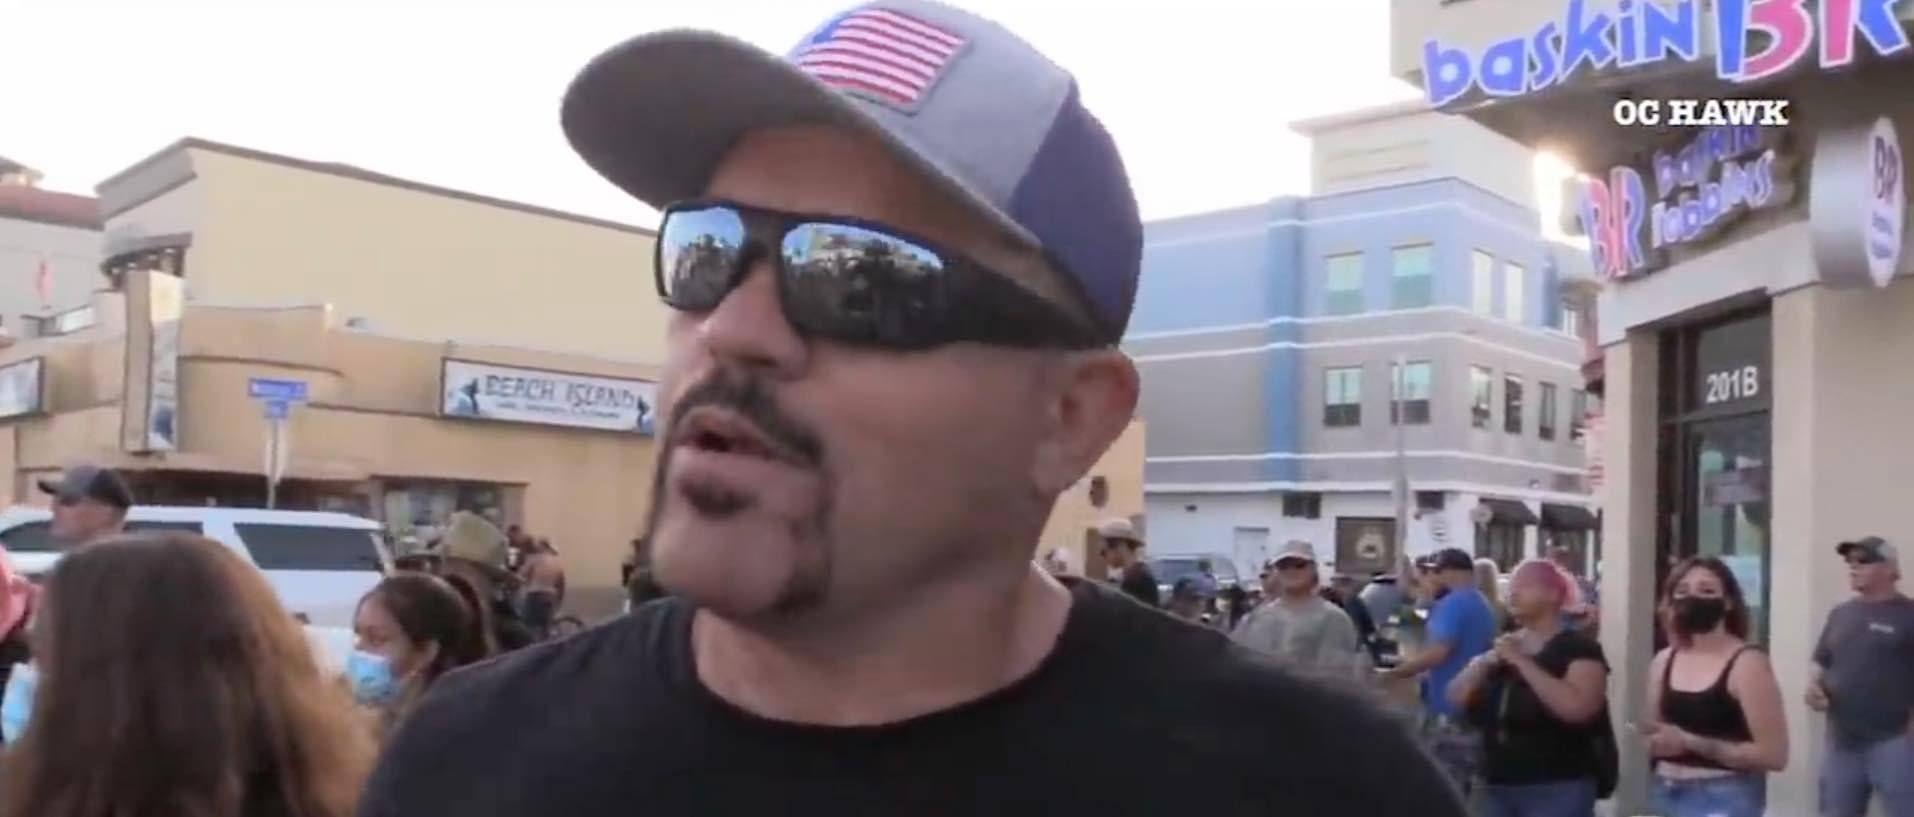 The Ice Man Calmeth Watch Chuck Liddell Cool Down George Floyd Protest Tensions In Huntington Beach Chuck Liddell Huntington Beach Chucks